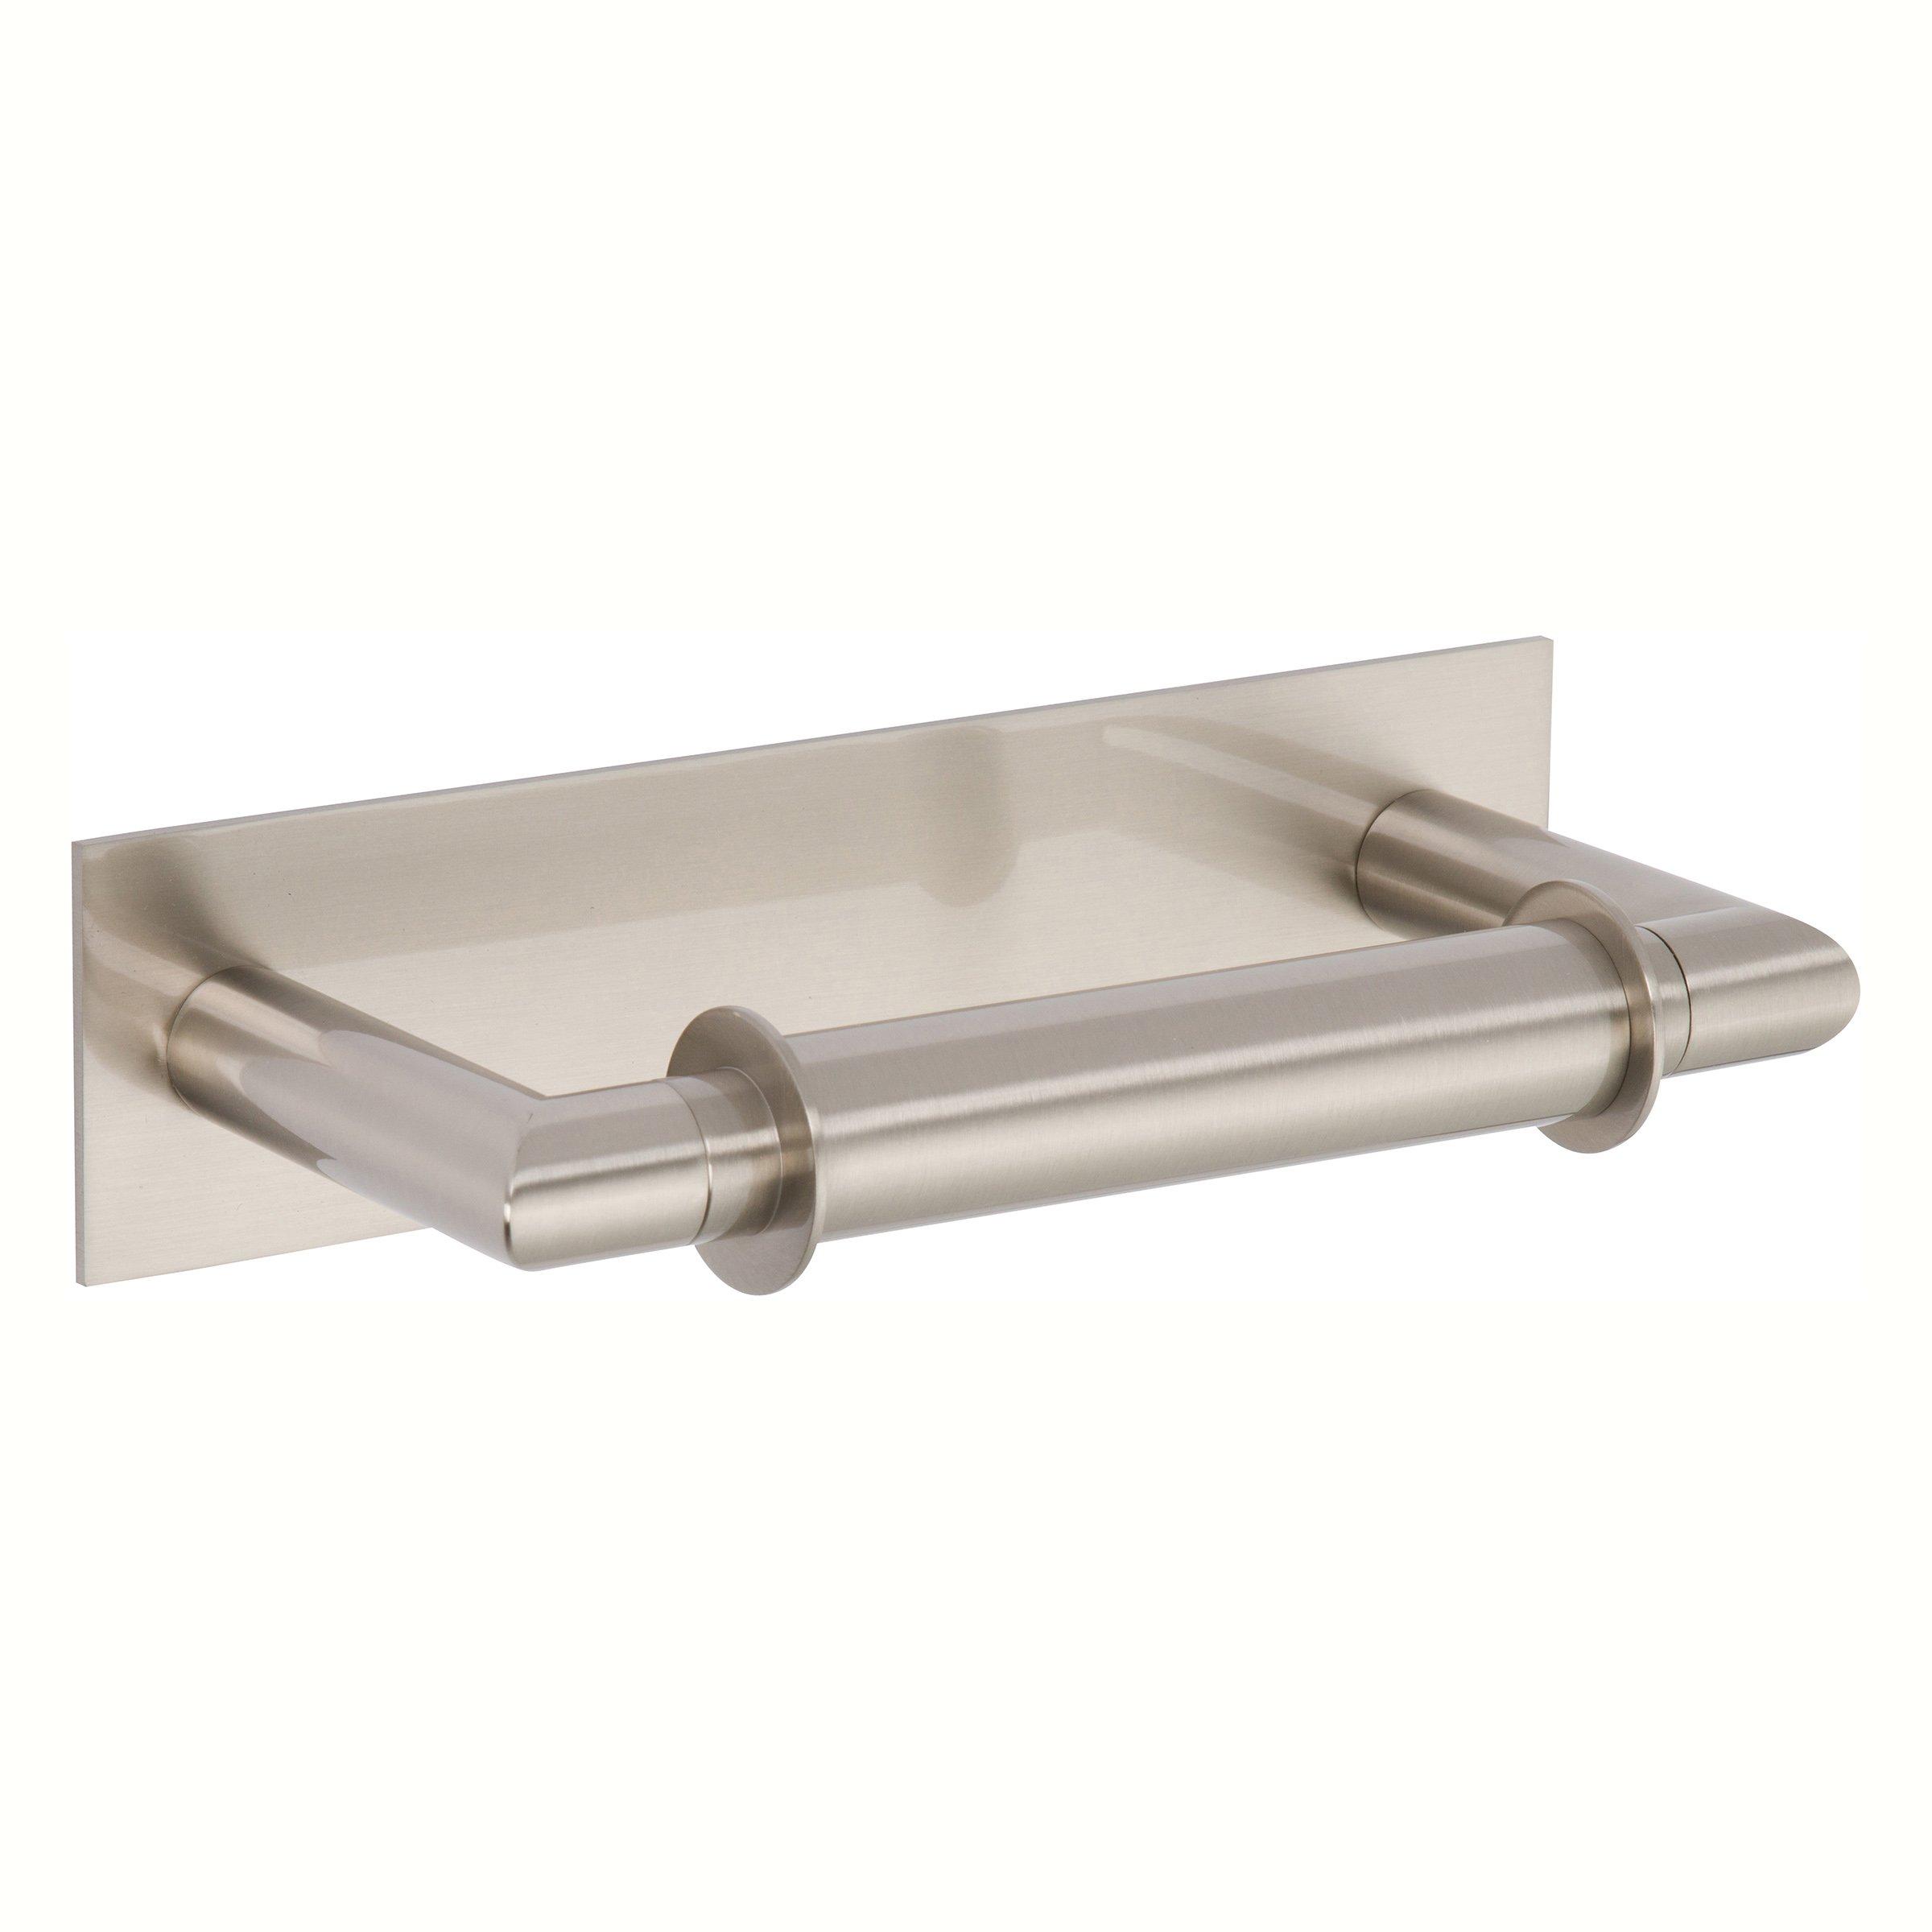 Ginger 2808/SN Surface Double Post Toilet Tissue Holder, Satin Nickel